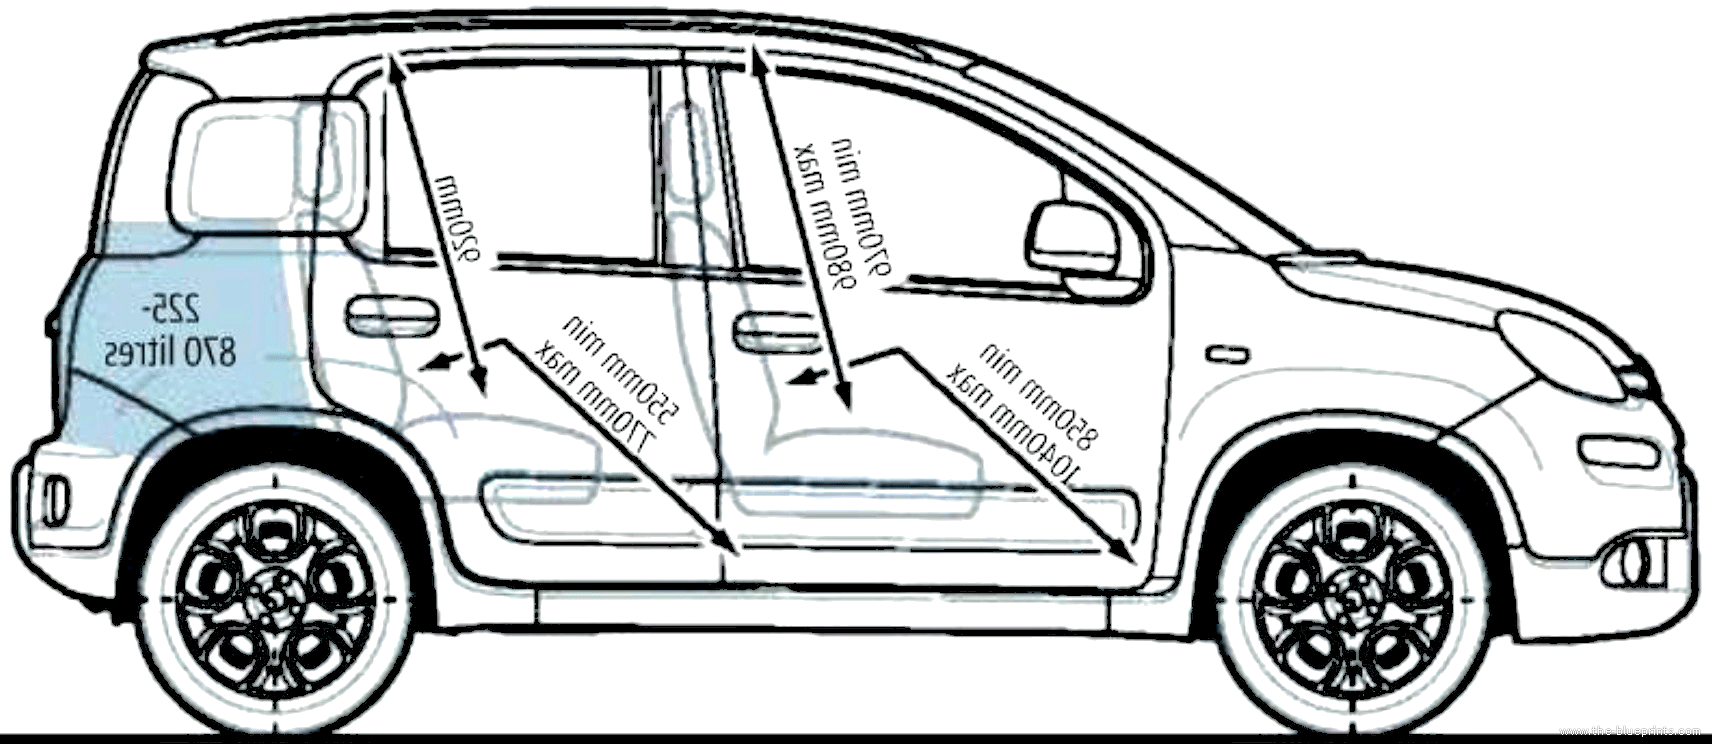 blueprints cars fiat fiat panda 4x4 2013. Black Bedroom Furniture Sets. Home Design Ideas